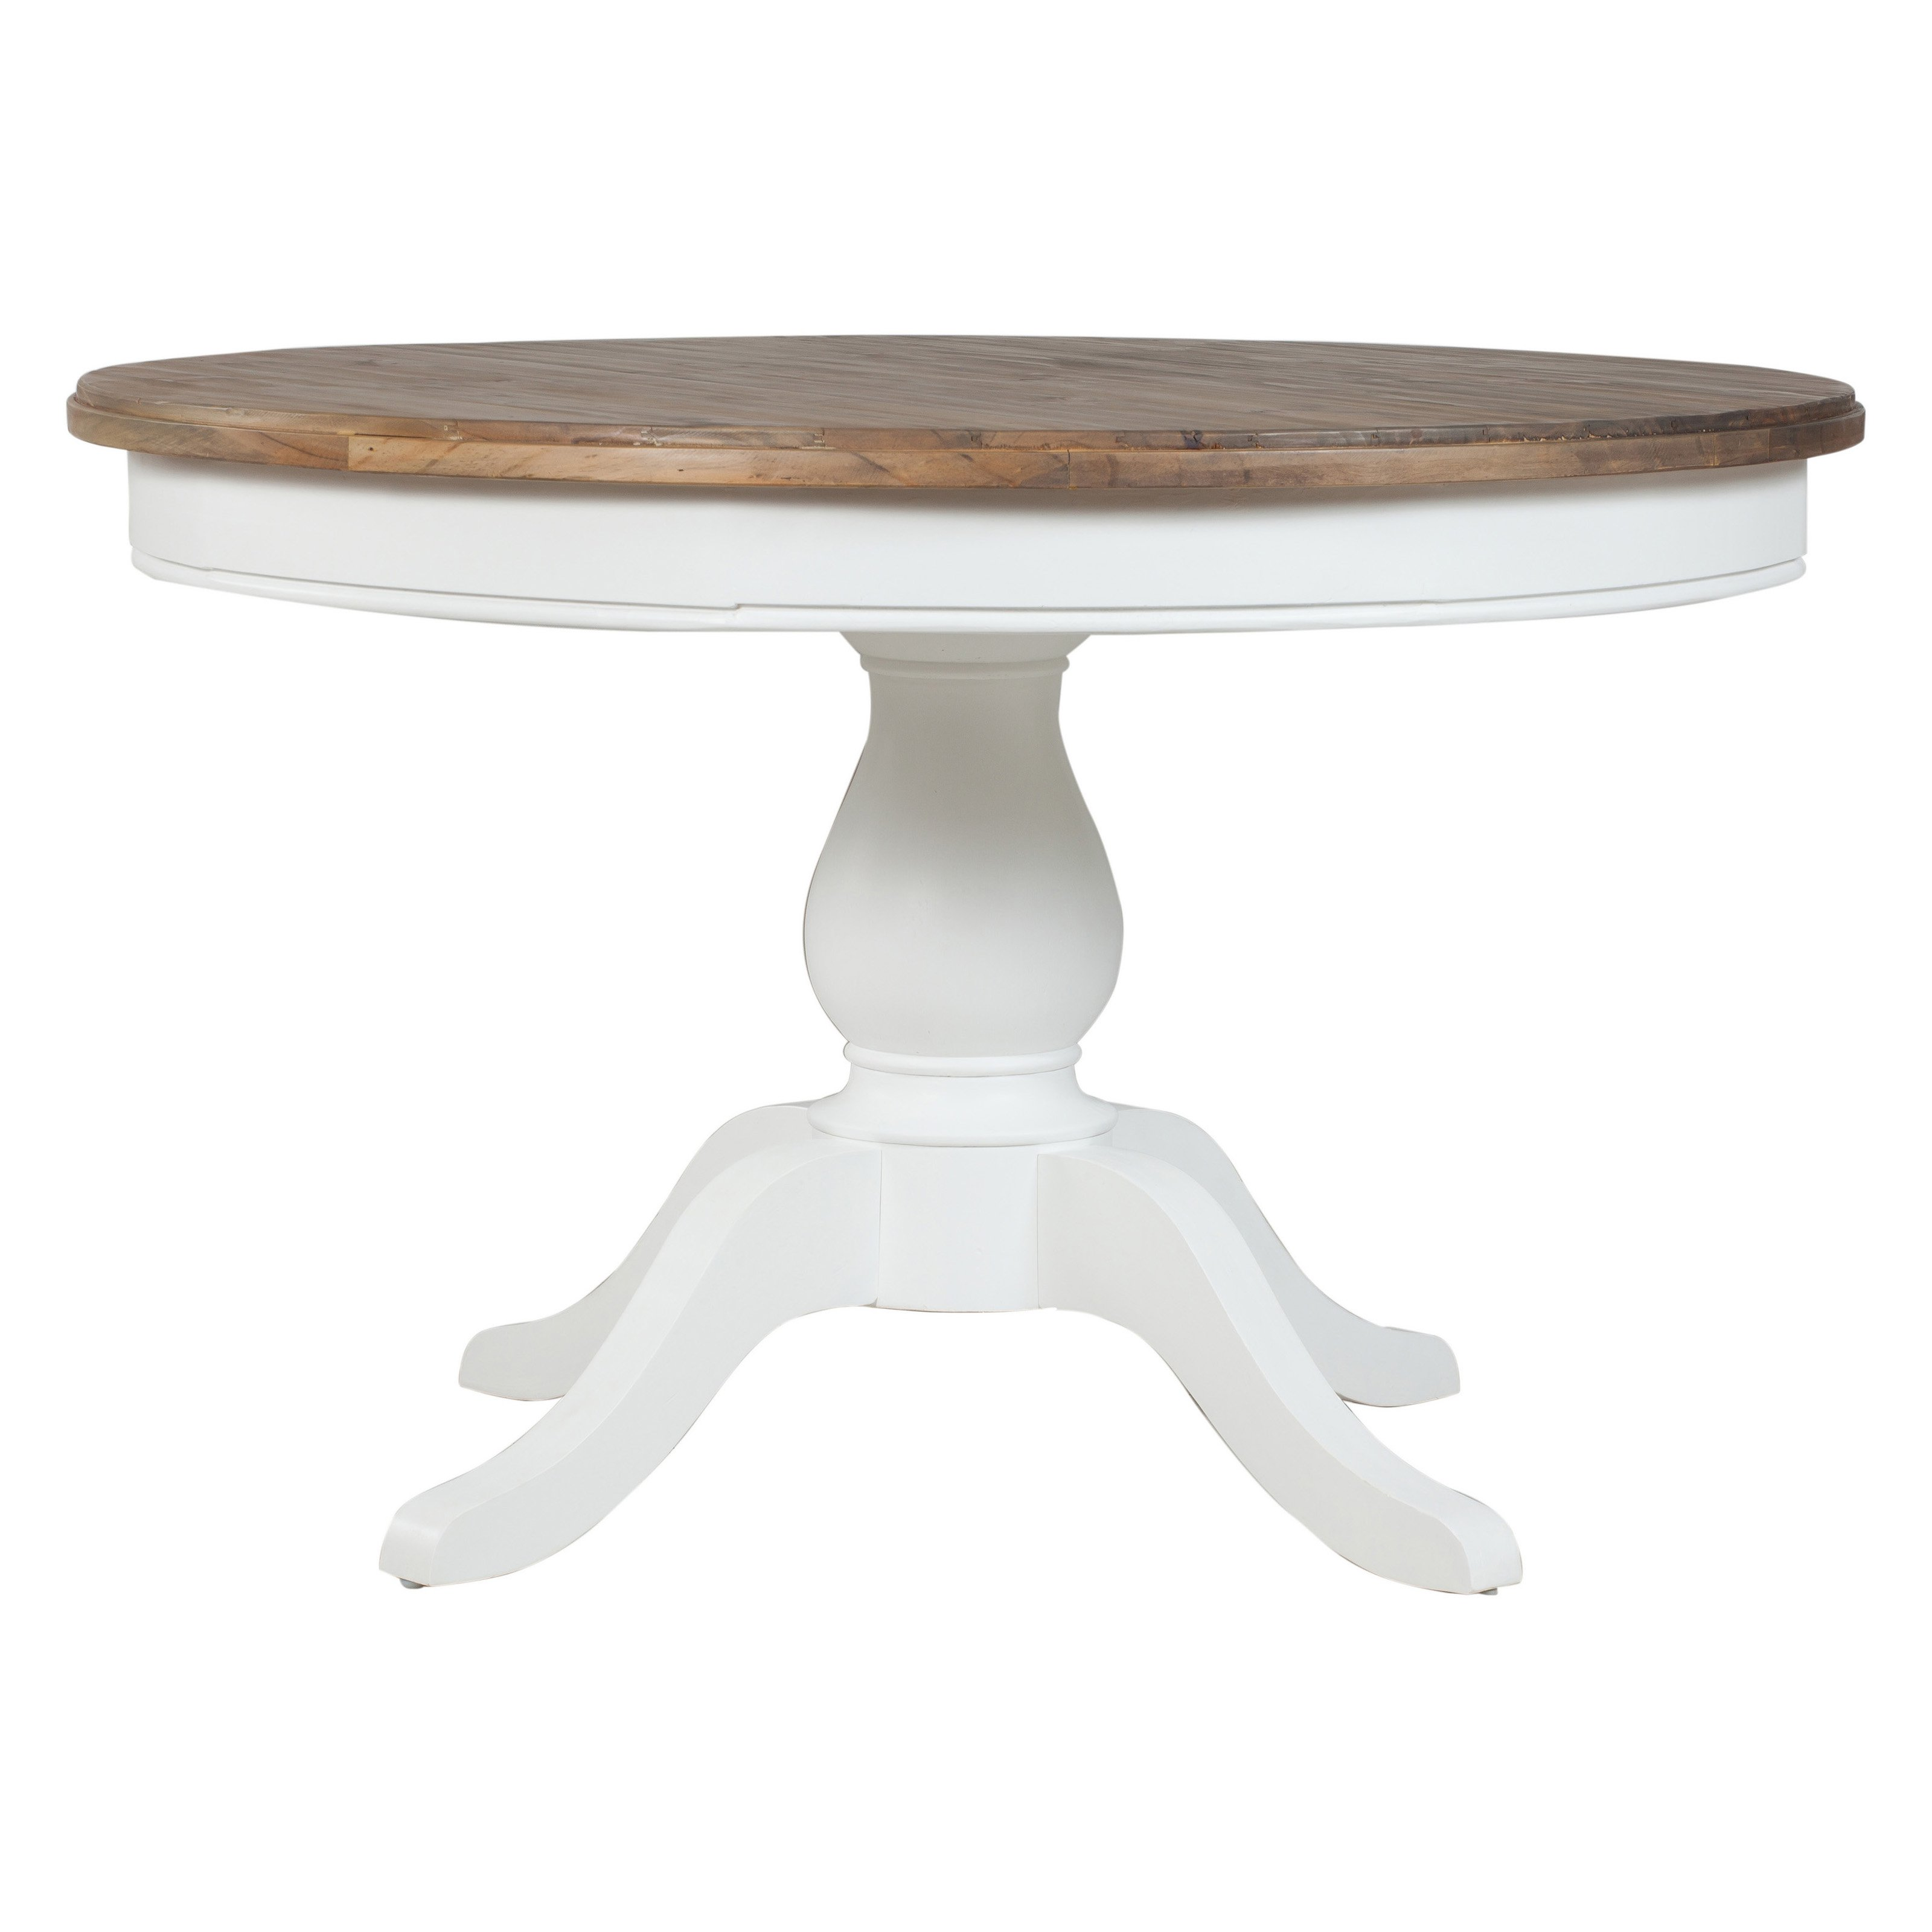 CDI International Furniture Ontario Round Pedestal Dining Table by